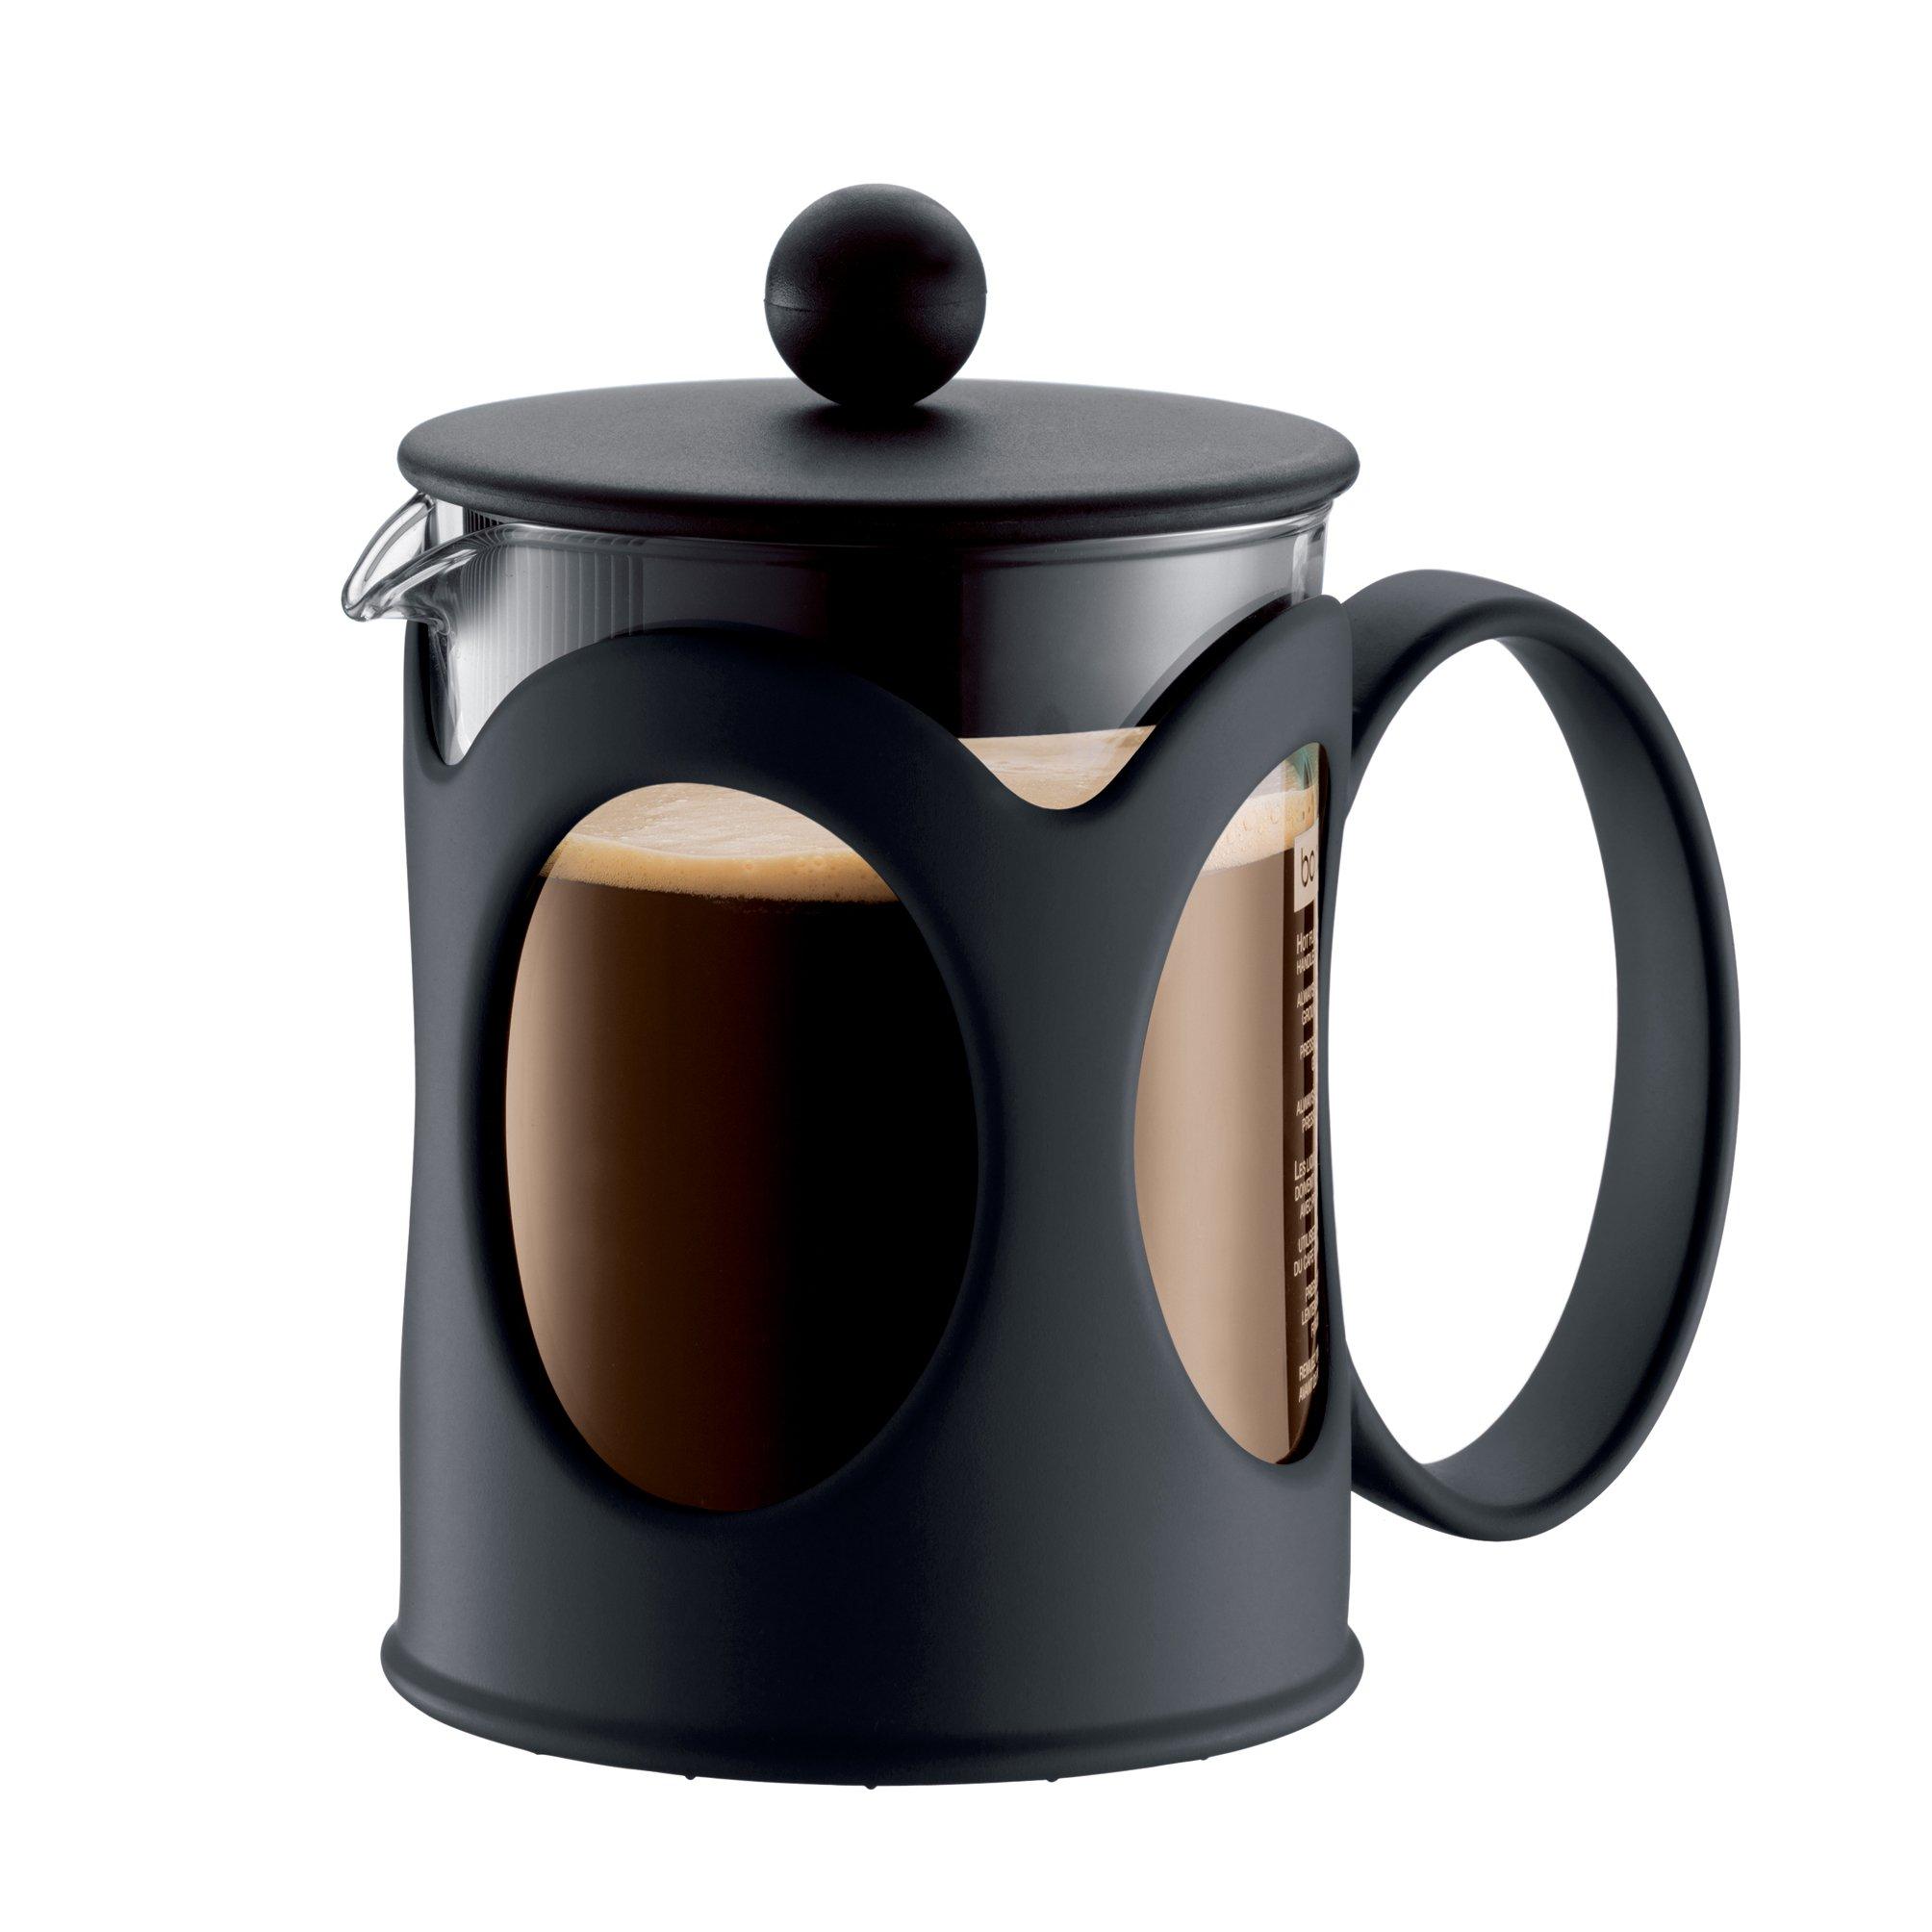 Bodum KENYA Coffee Maker, French Press Coffee Maker, Black, 17 Ounce